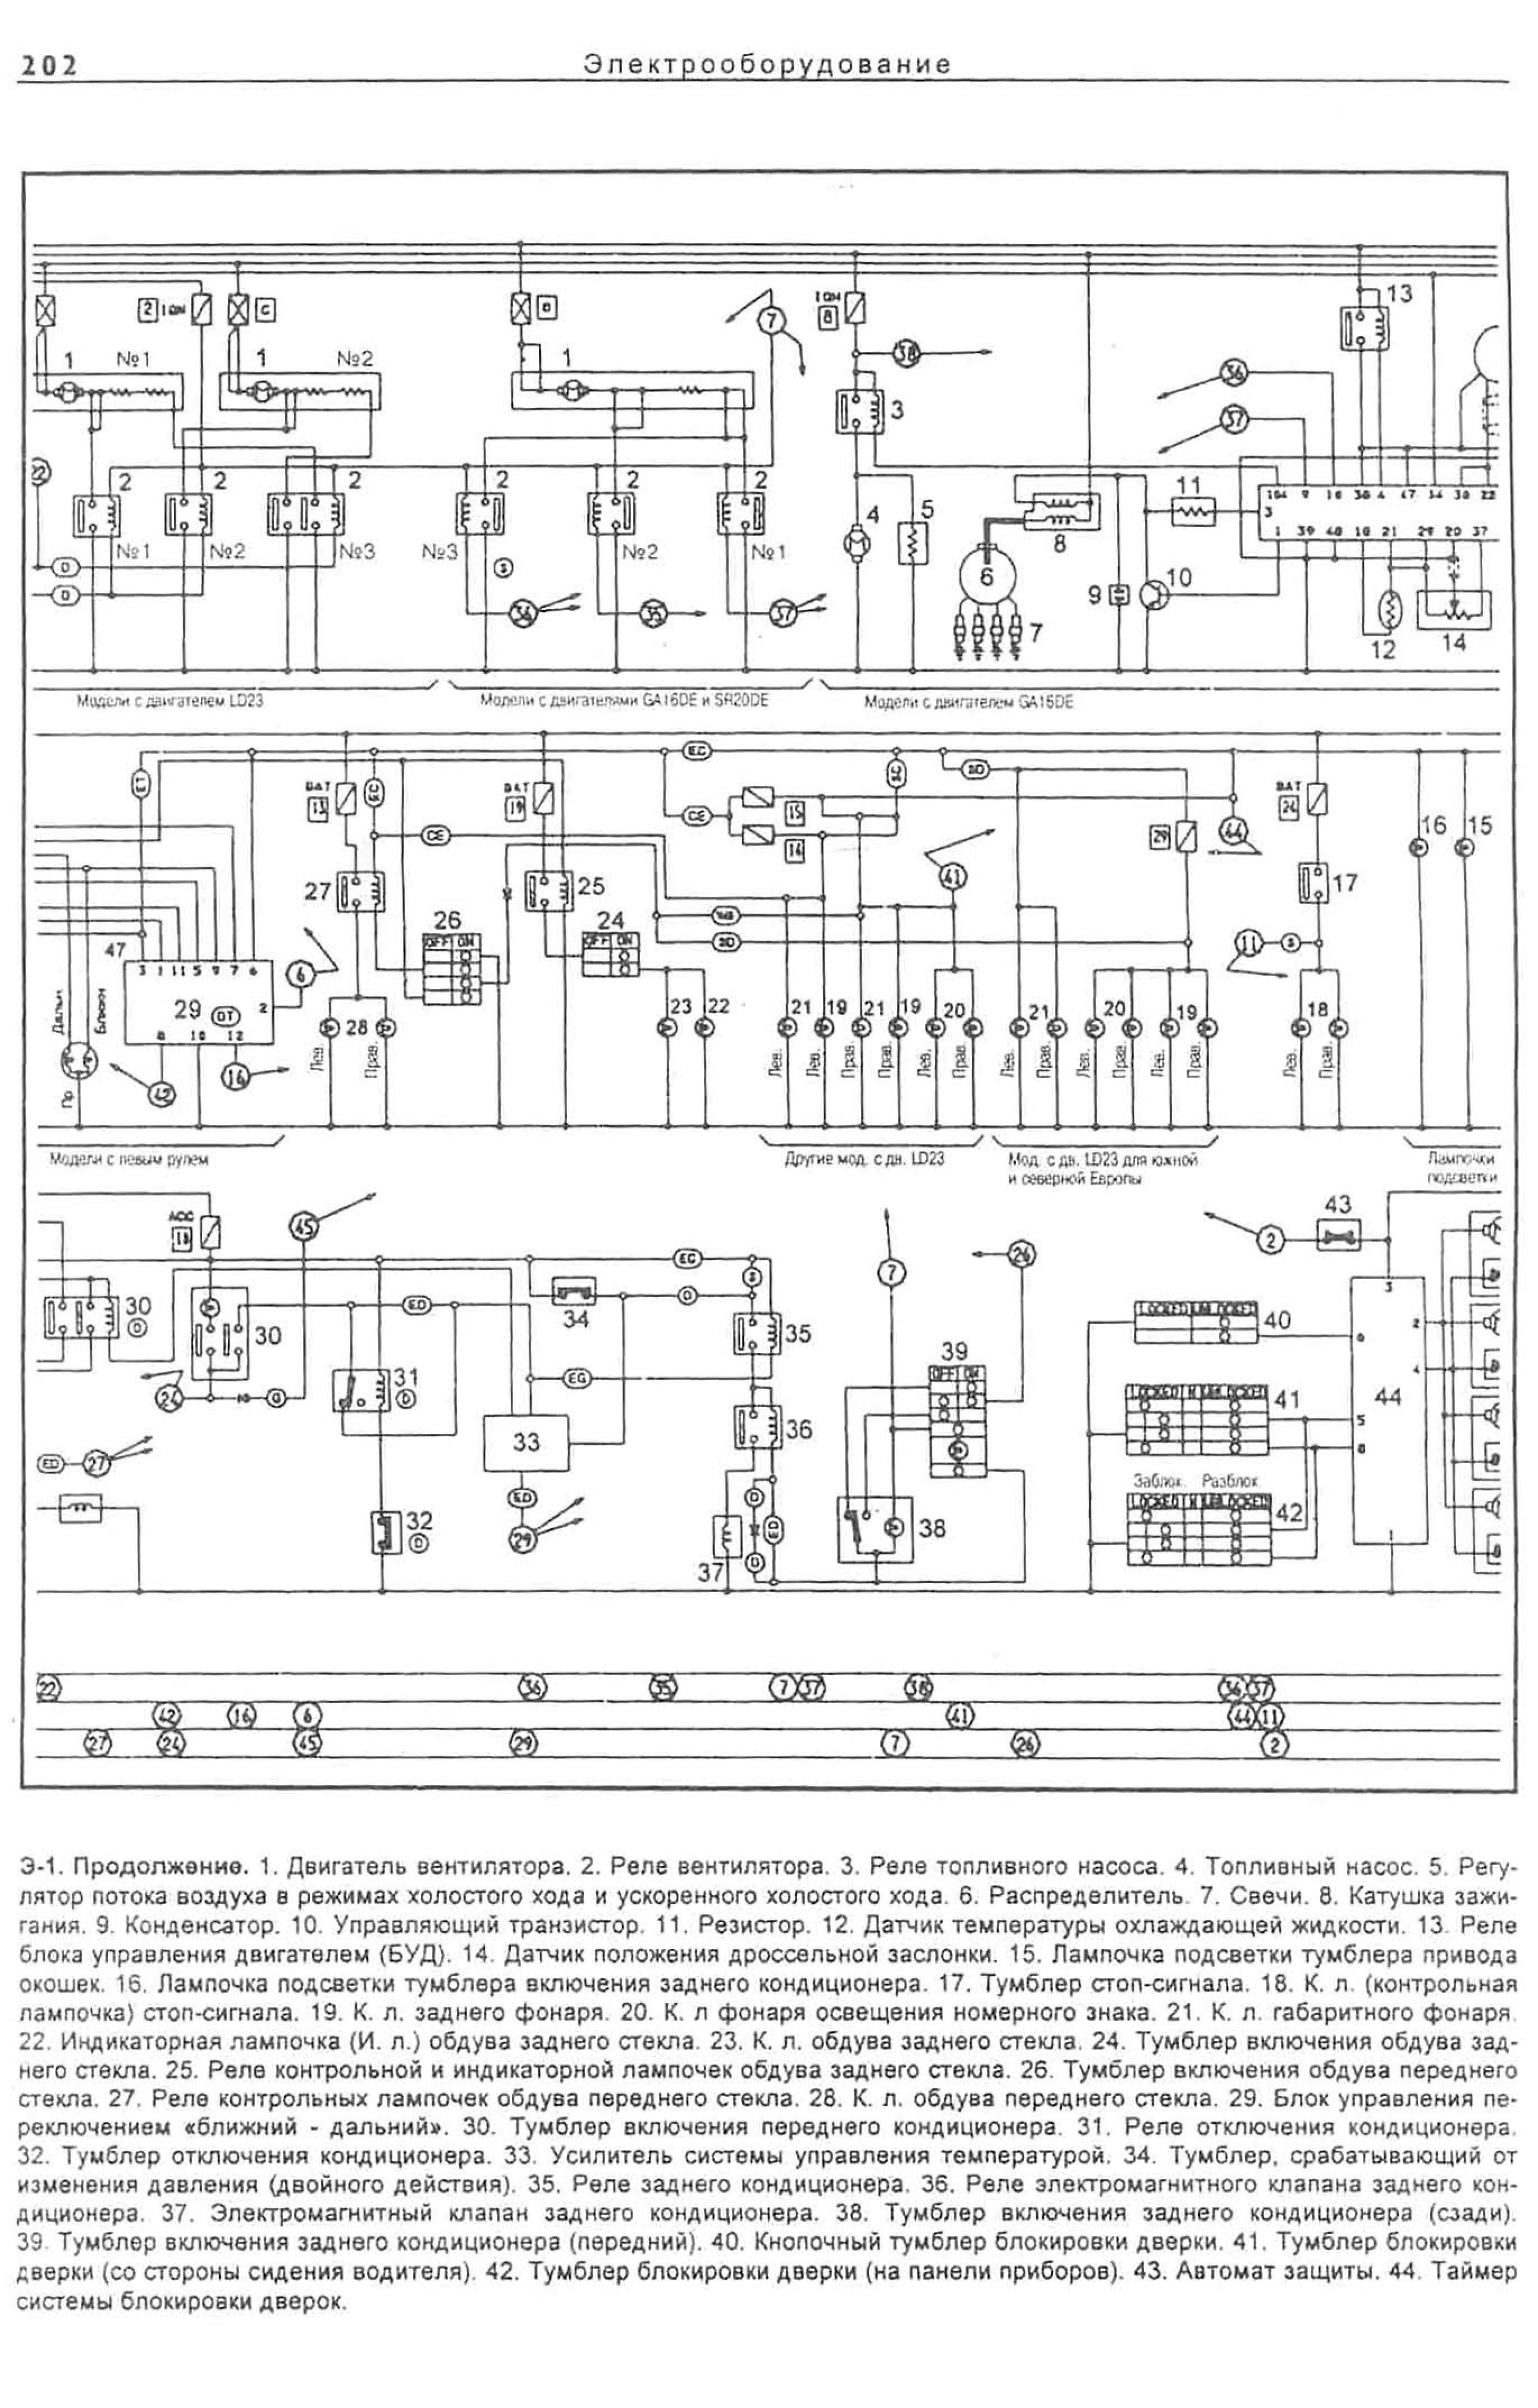 Руководство по ремонту автомобиля NISSAN VANETTE, SERENA, URVAN 1979-1993 года выпуска.